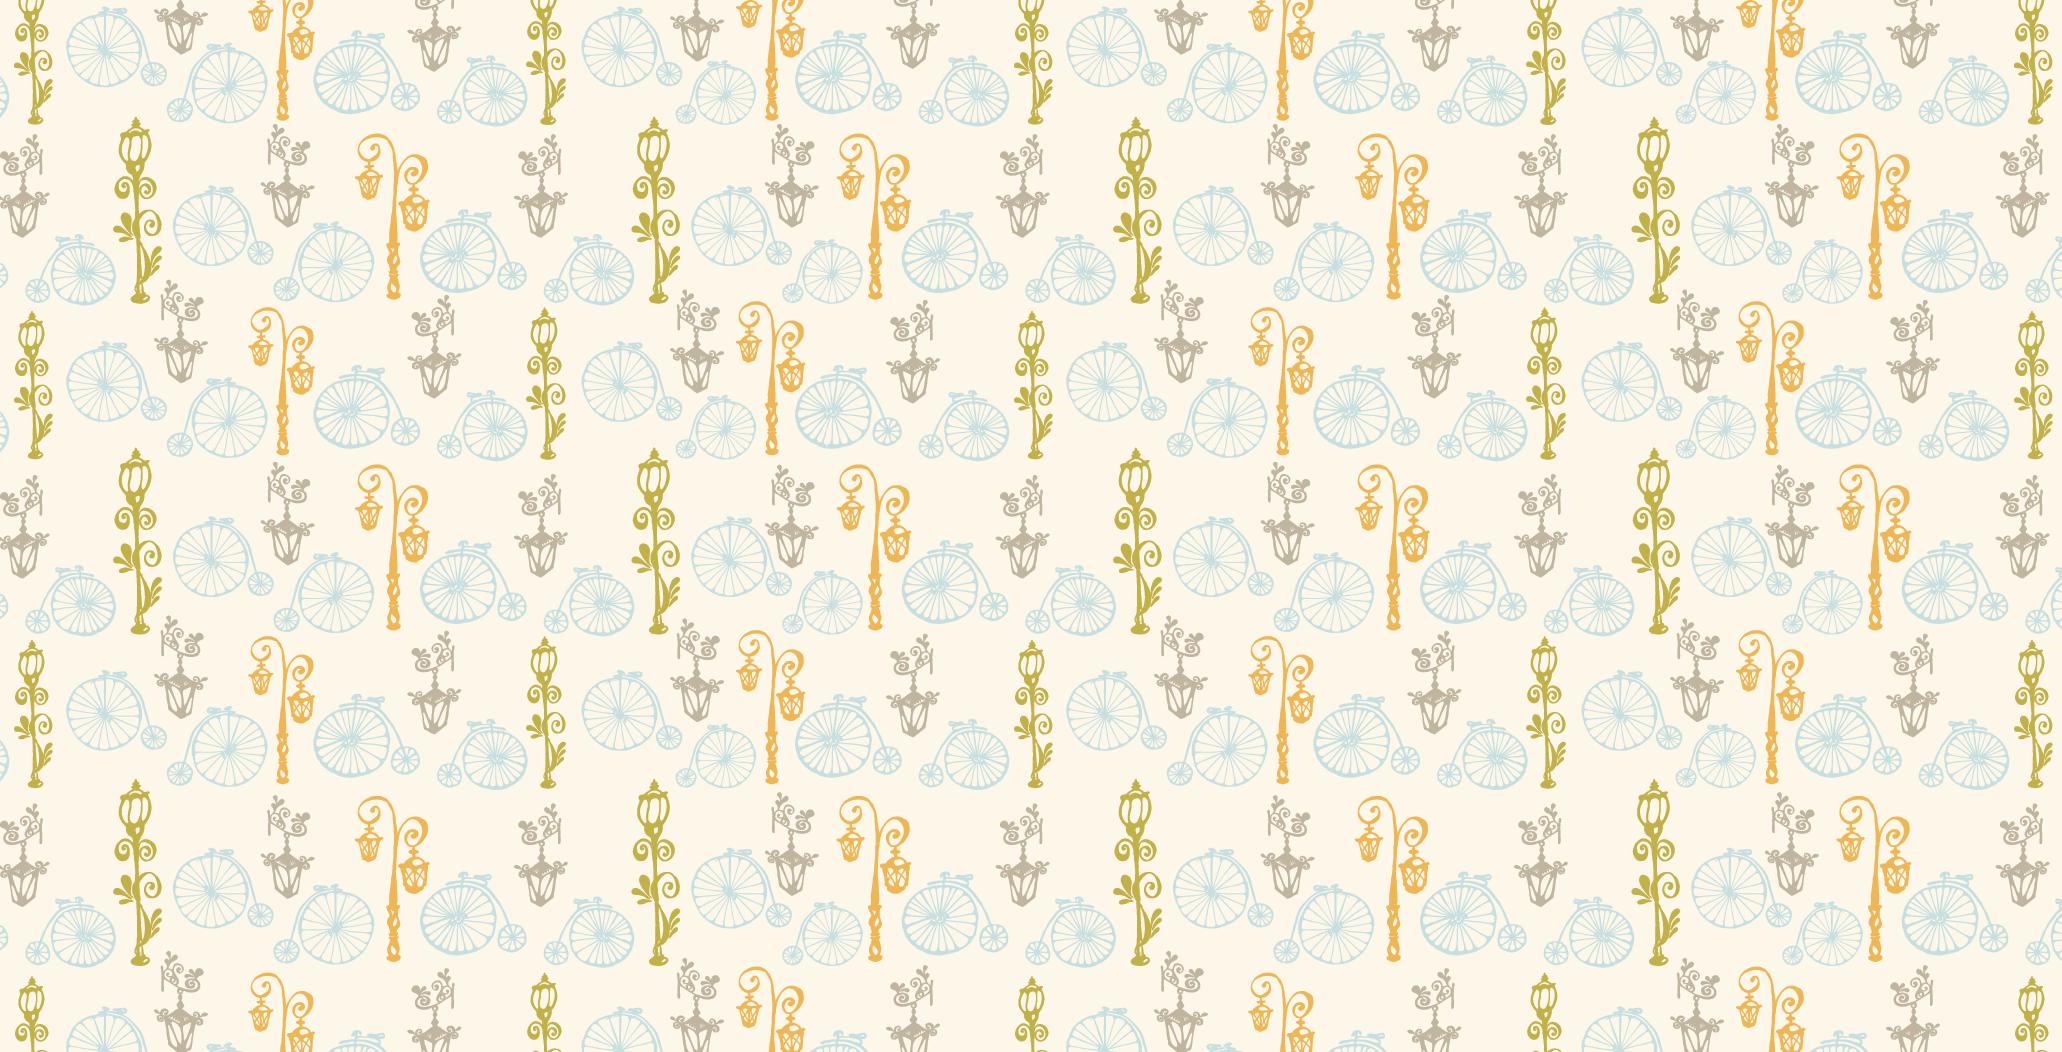 elena-wilken-walk-in-the-countryside-surface-pattern-design5.png